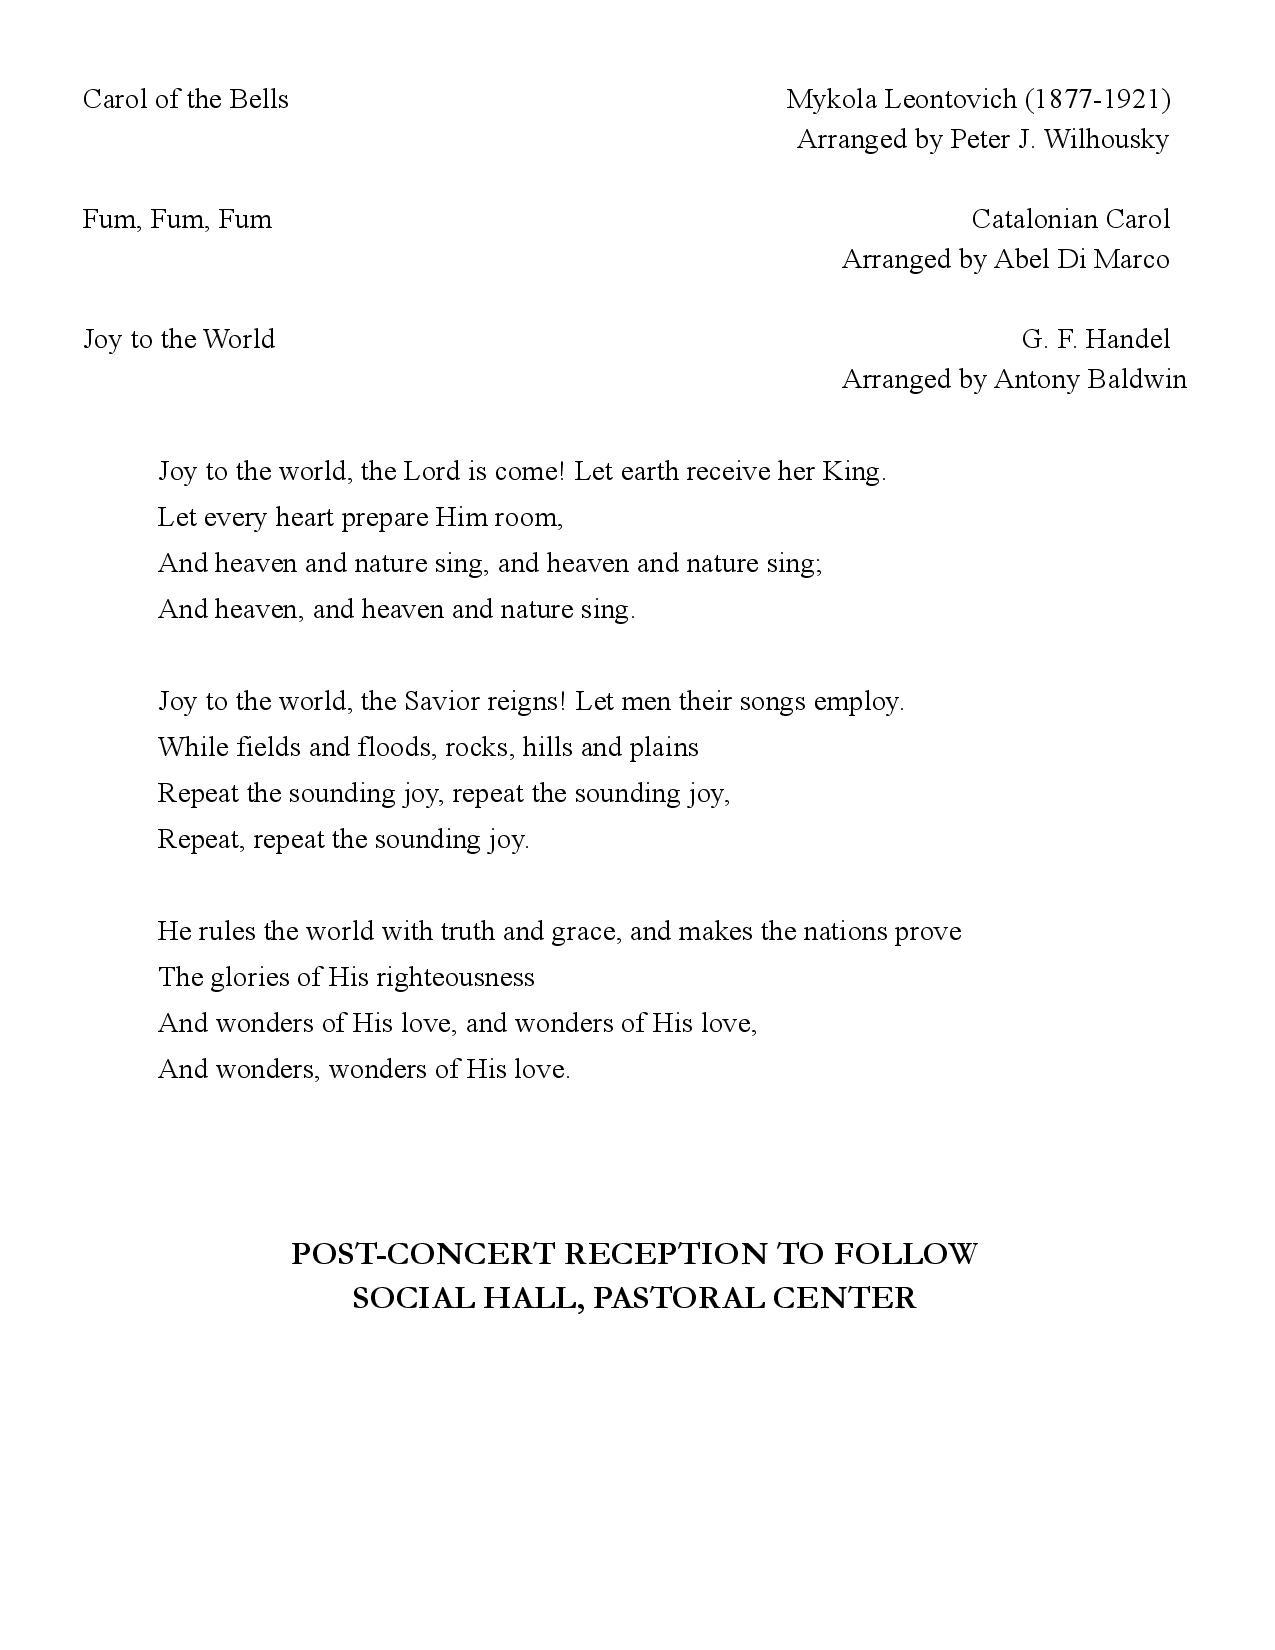 2012-12-16 Program Draft - 2012-12-11 v2-page-008.jpg